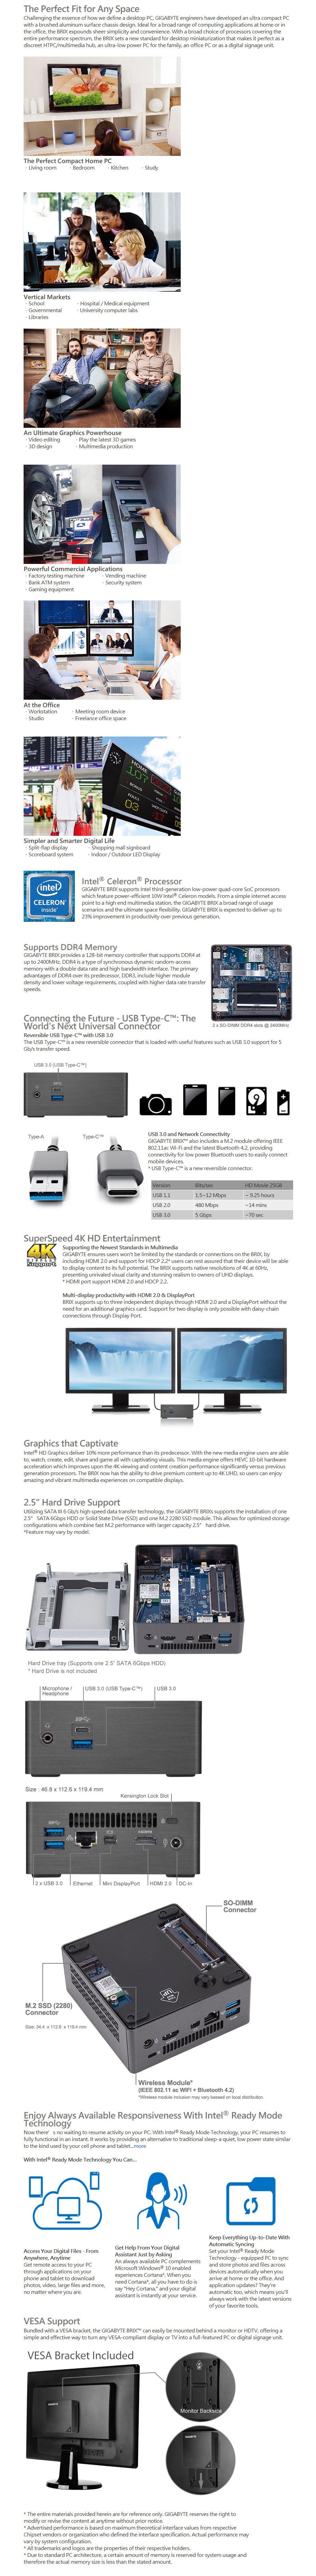 DIY Bundle Deal: Gigabyte Brix Celeron J4105 + 4GB RAM + 120GB SSD